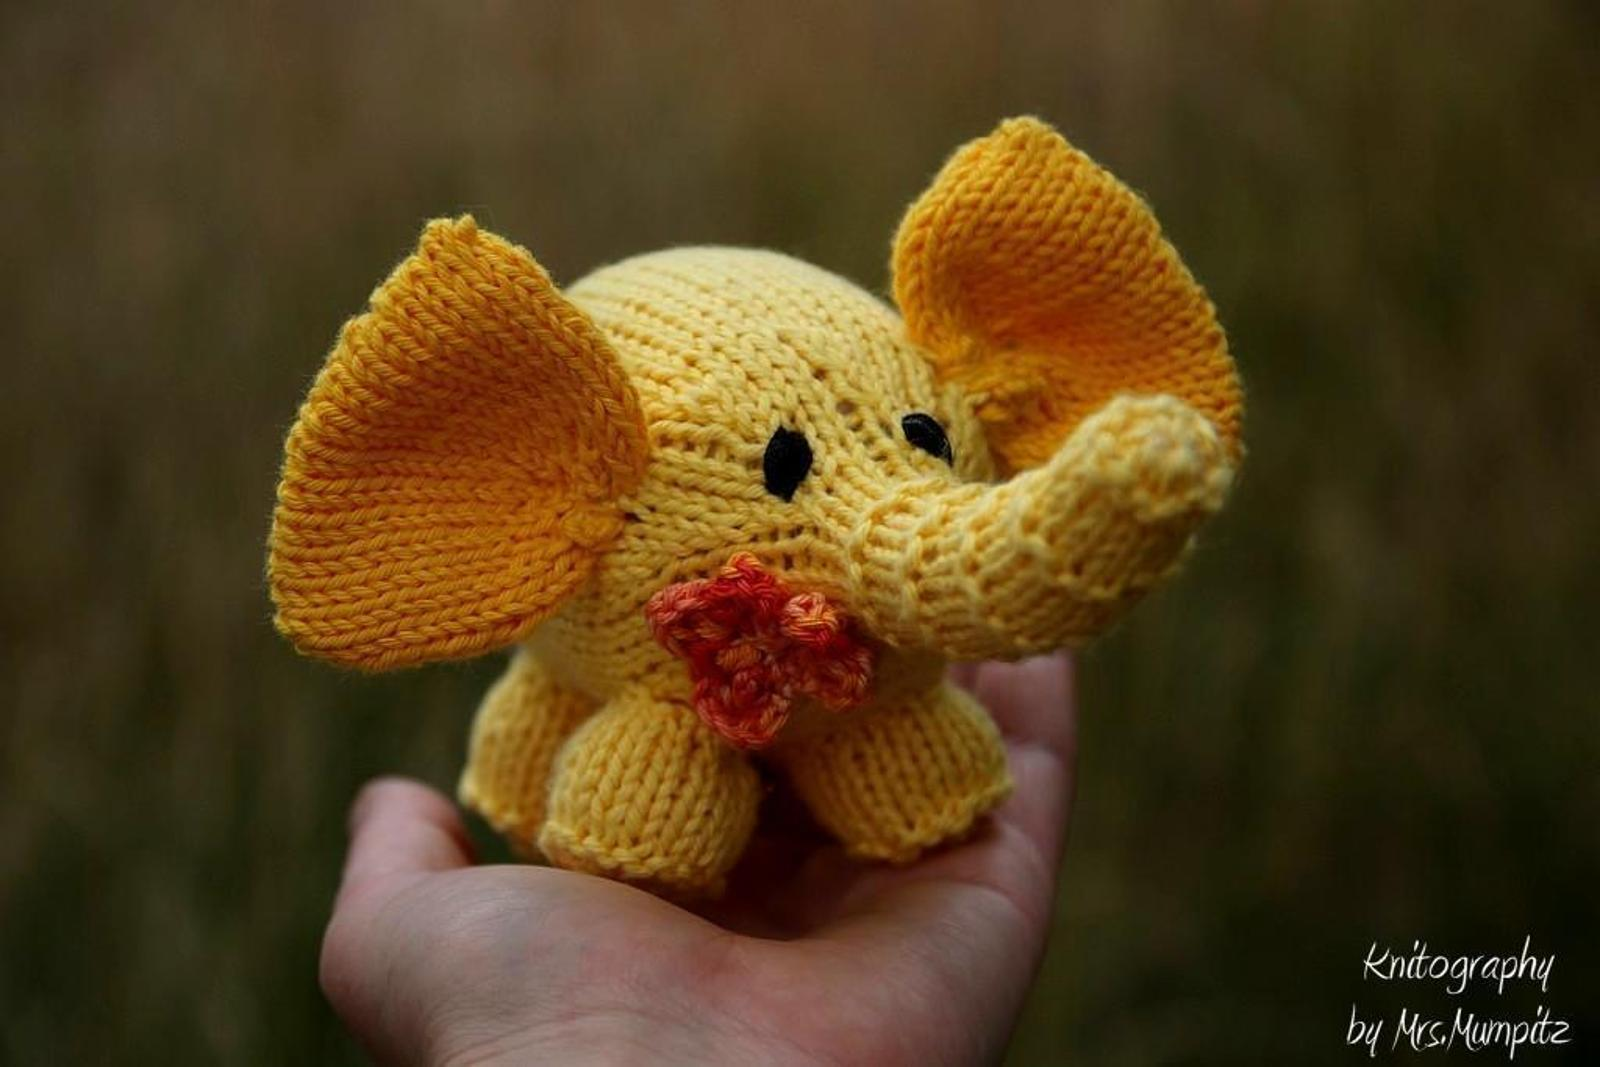 Judy the Elephant